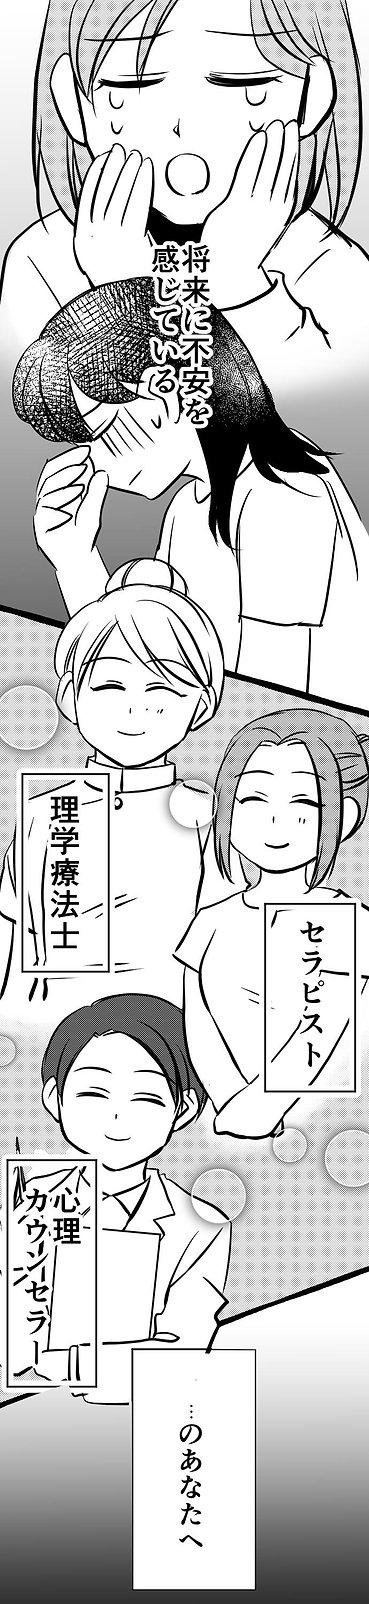 HY_PR_manga_LP_2019_01_将来に不安.jpg